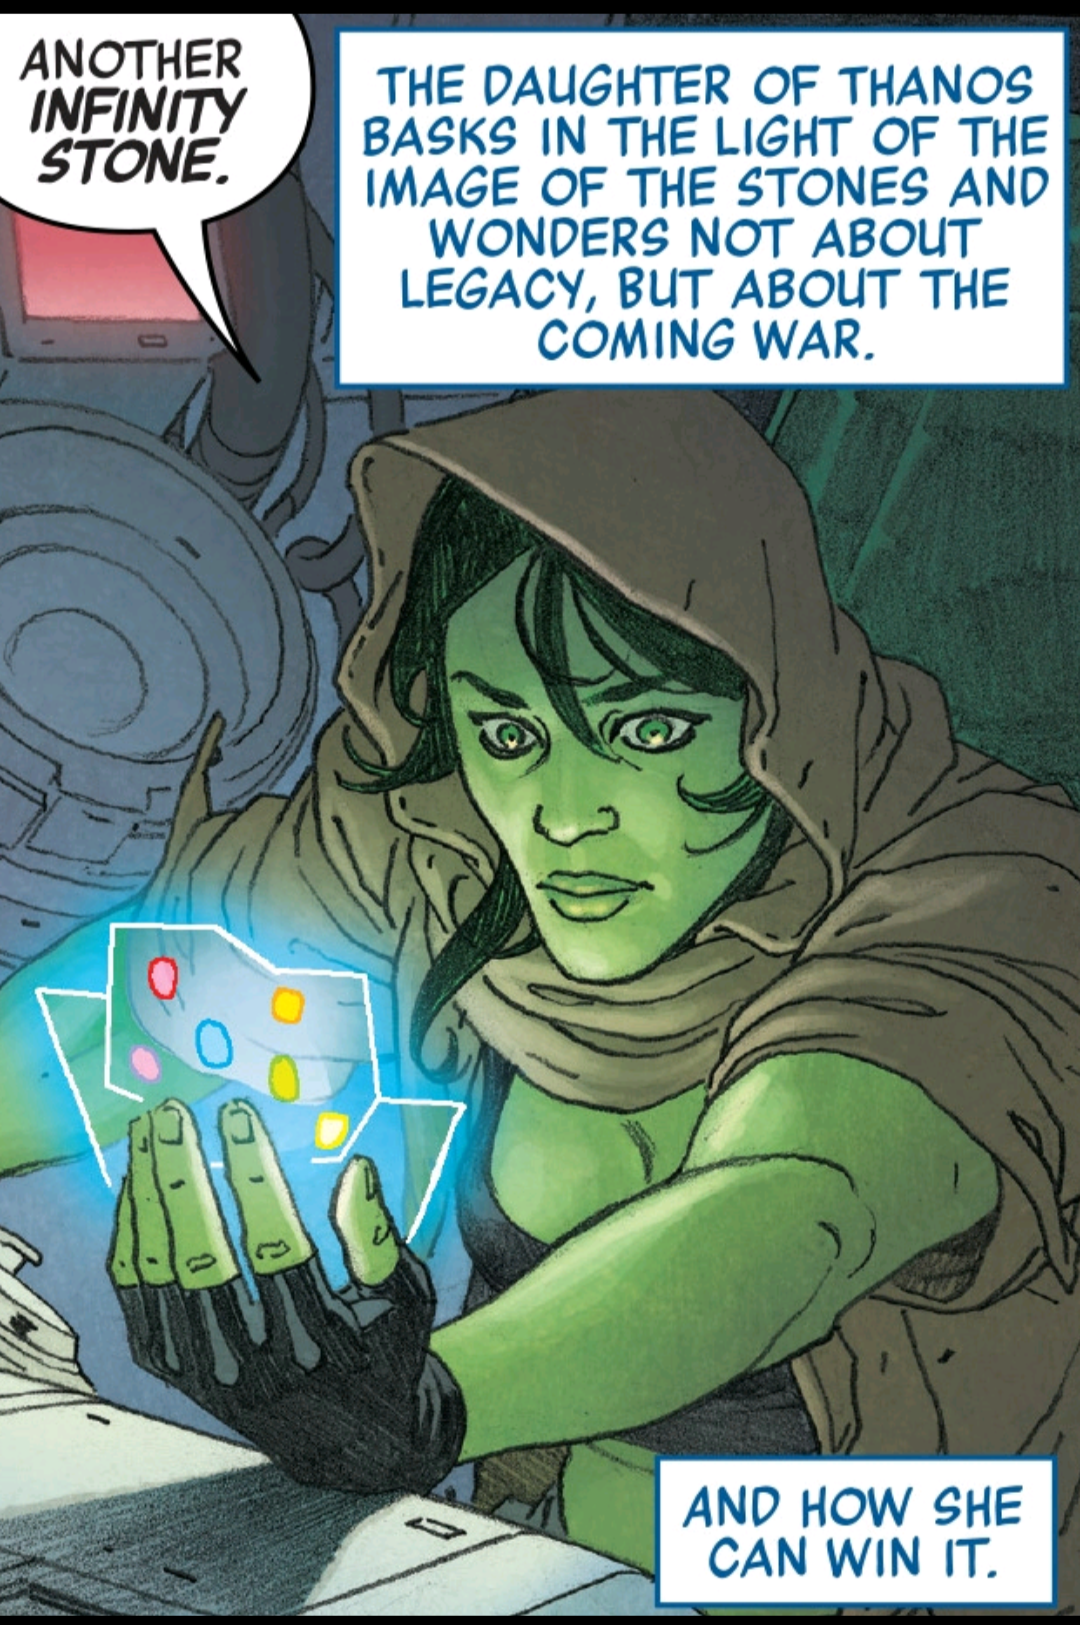 Gamora on the hunt for infinity stones